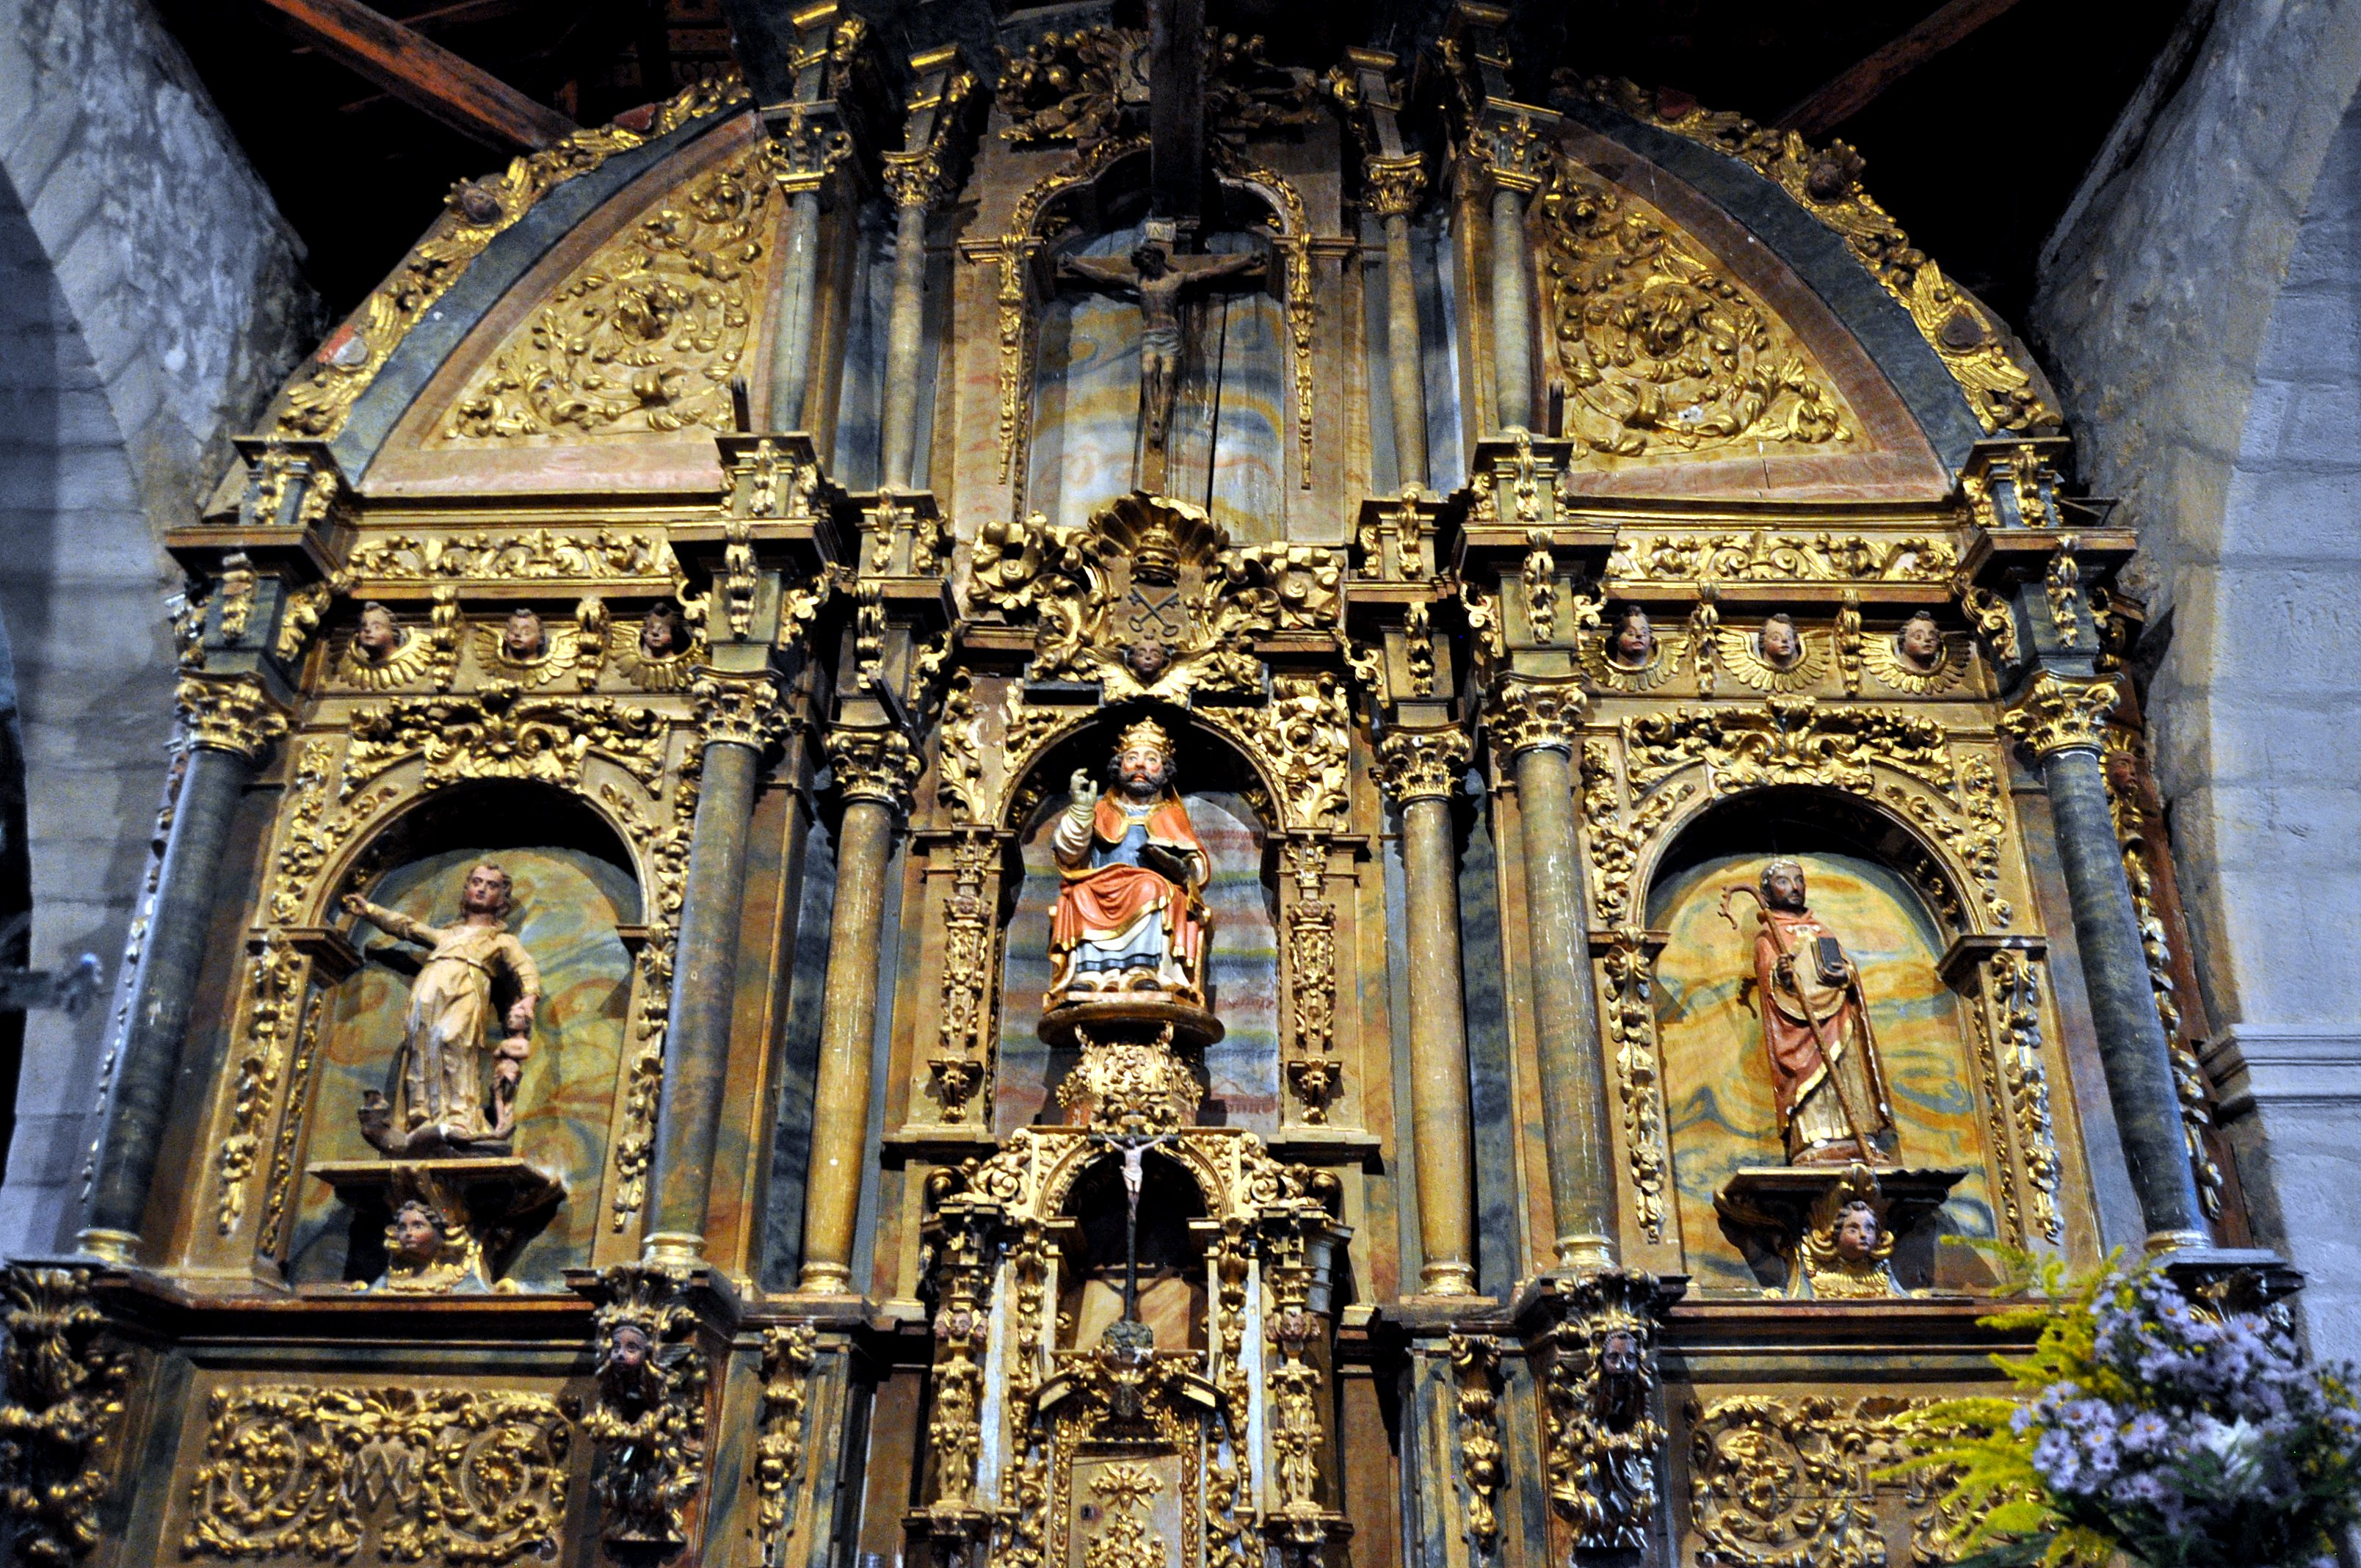 Retablo barroco e imágenes de diversas épocas en la iglesia de San Pedro